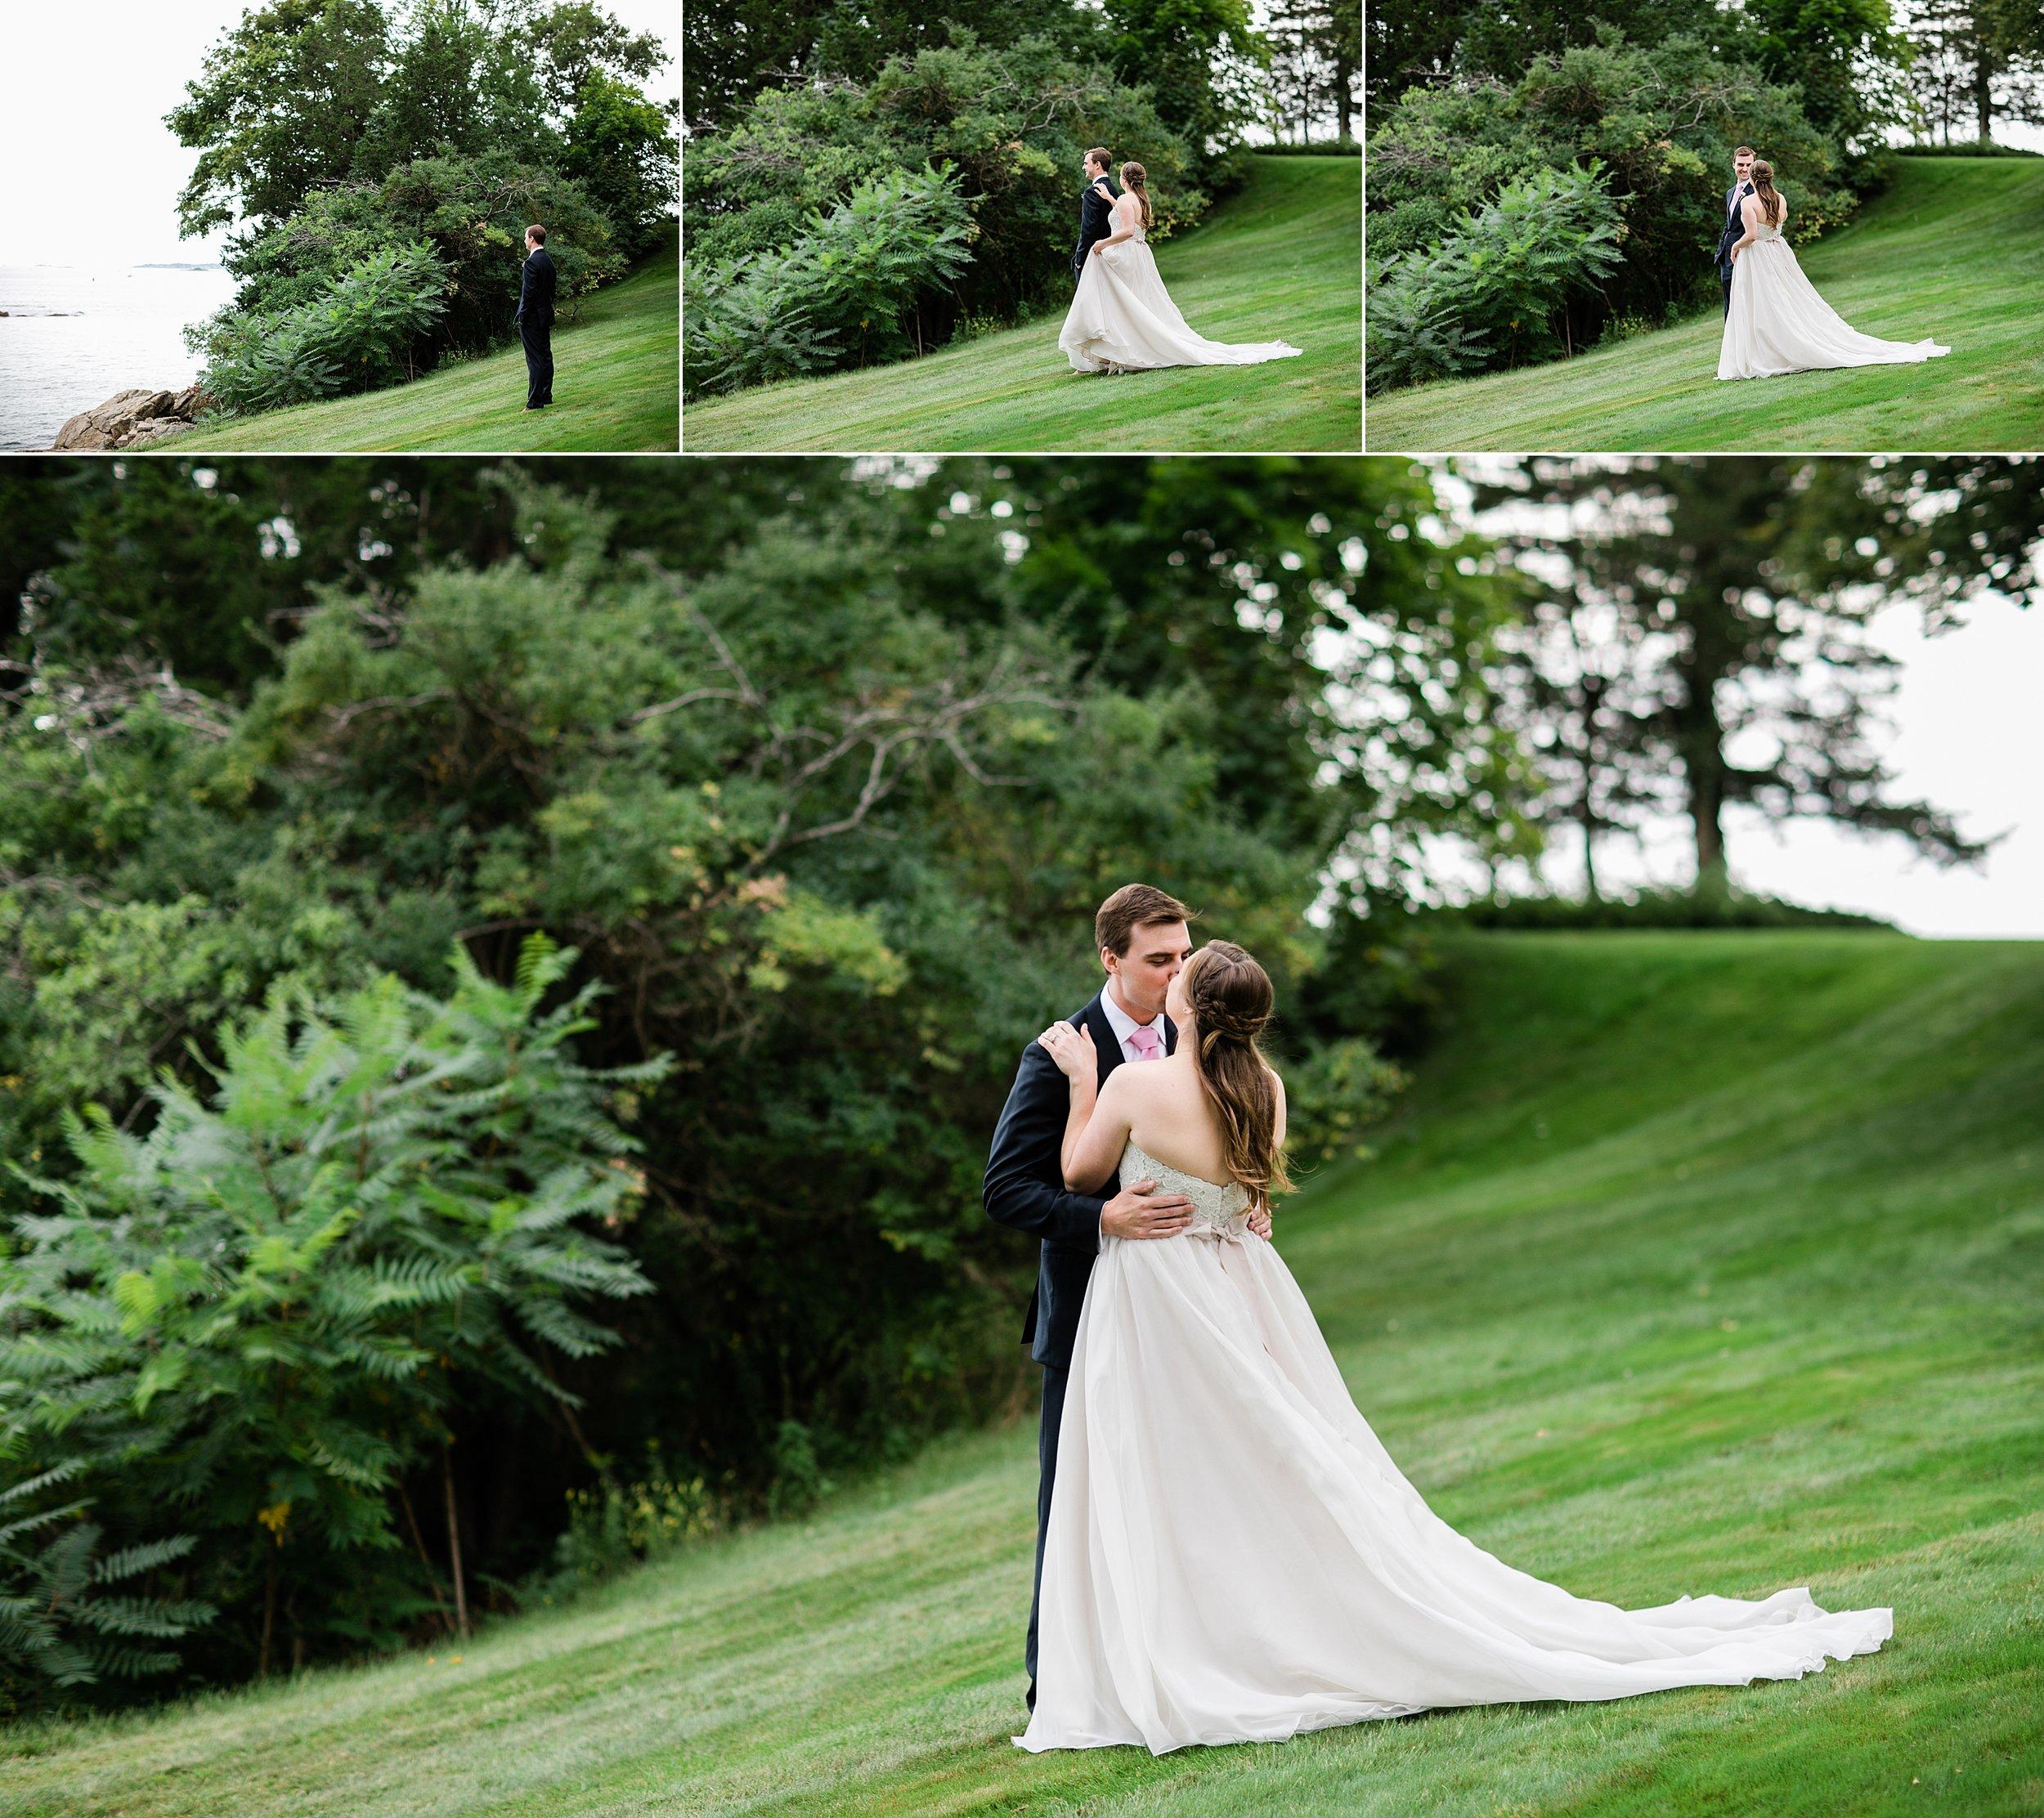 013 los angeles wedding photographer todd danforth photography boston.jpg